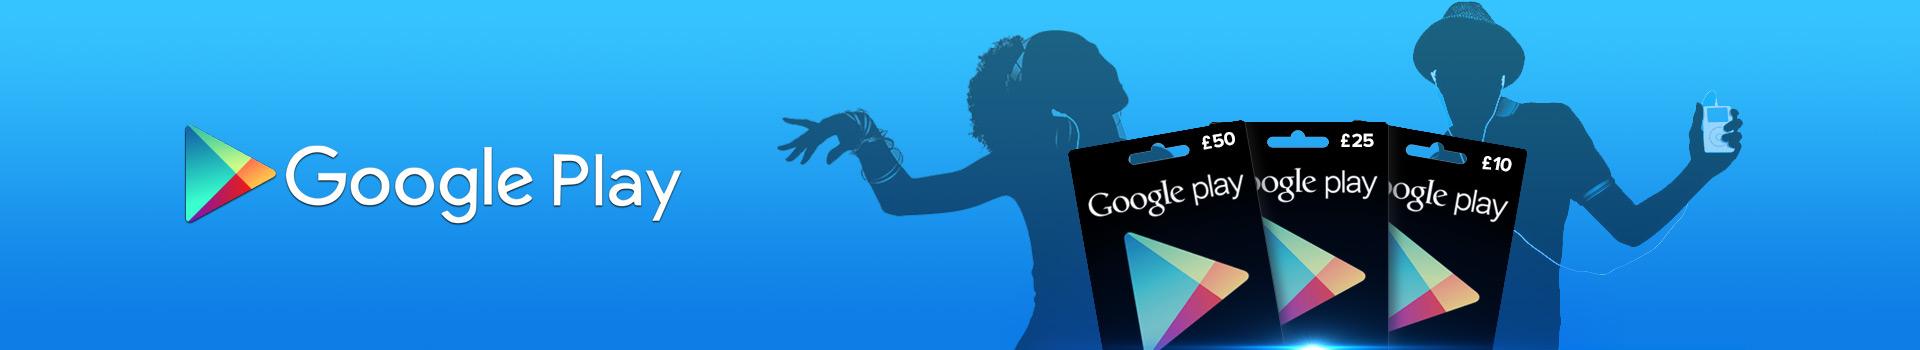 Buy Google Play Card